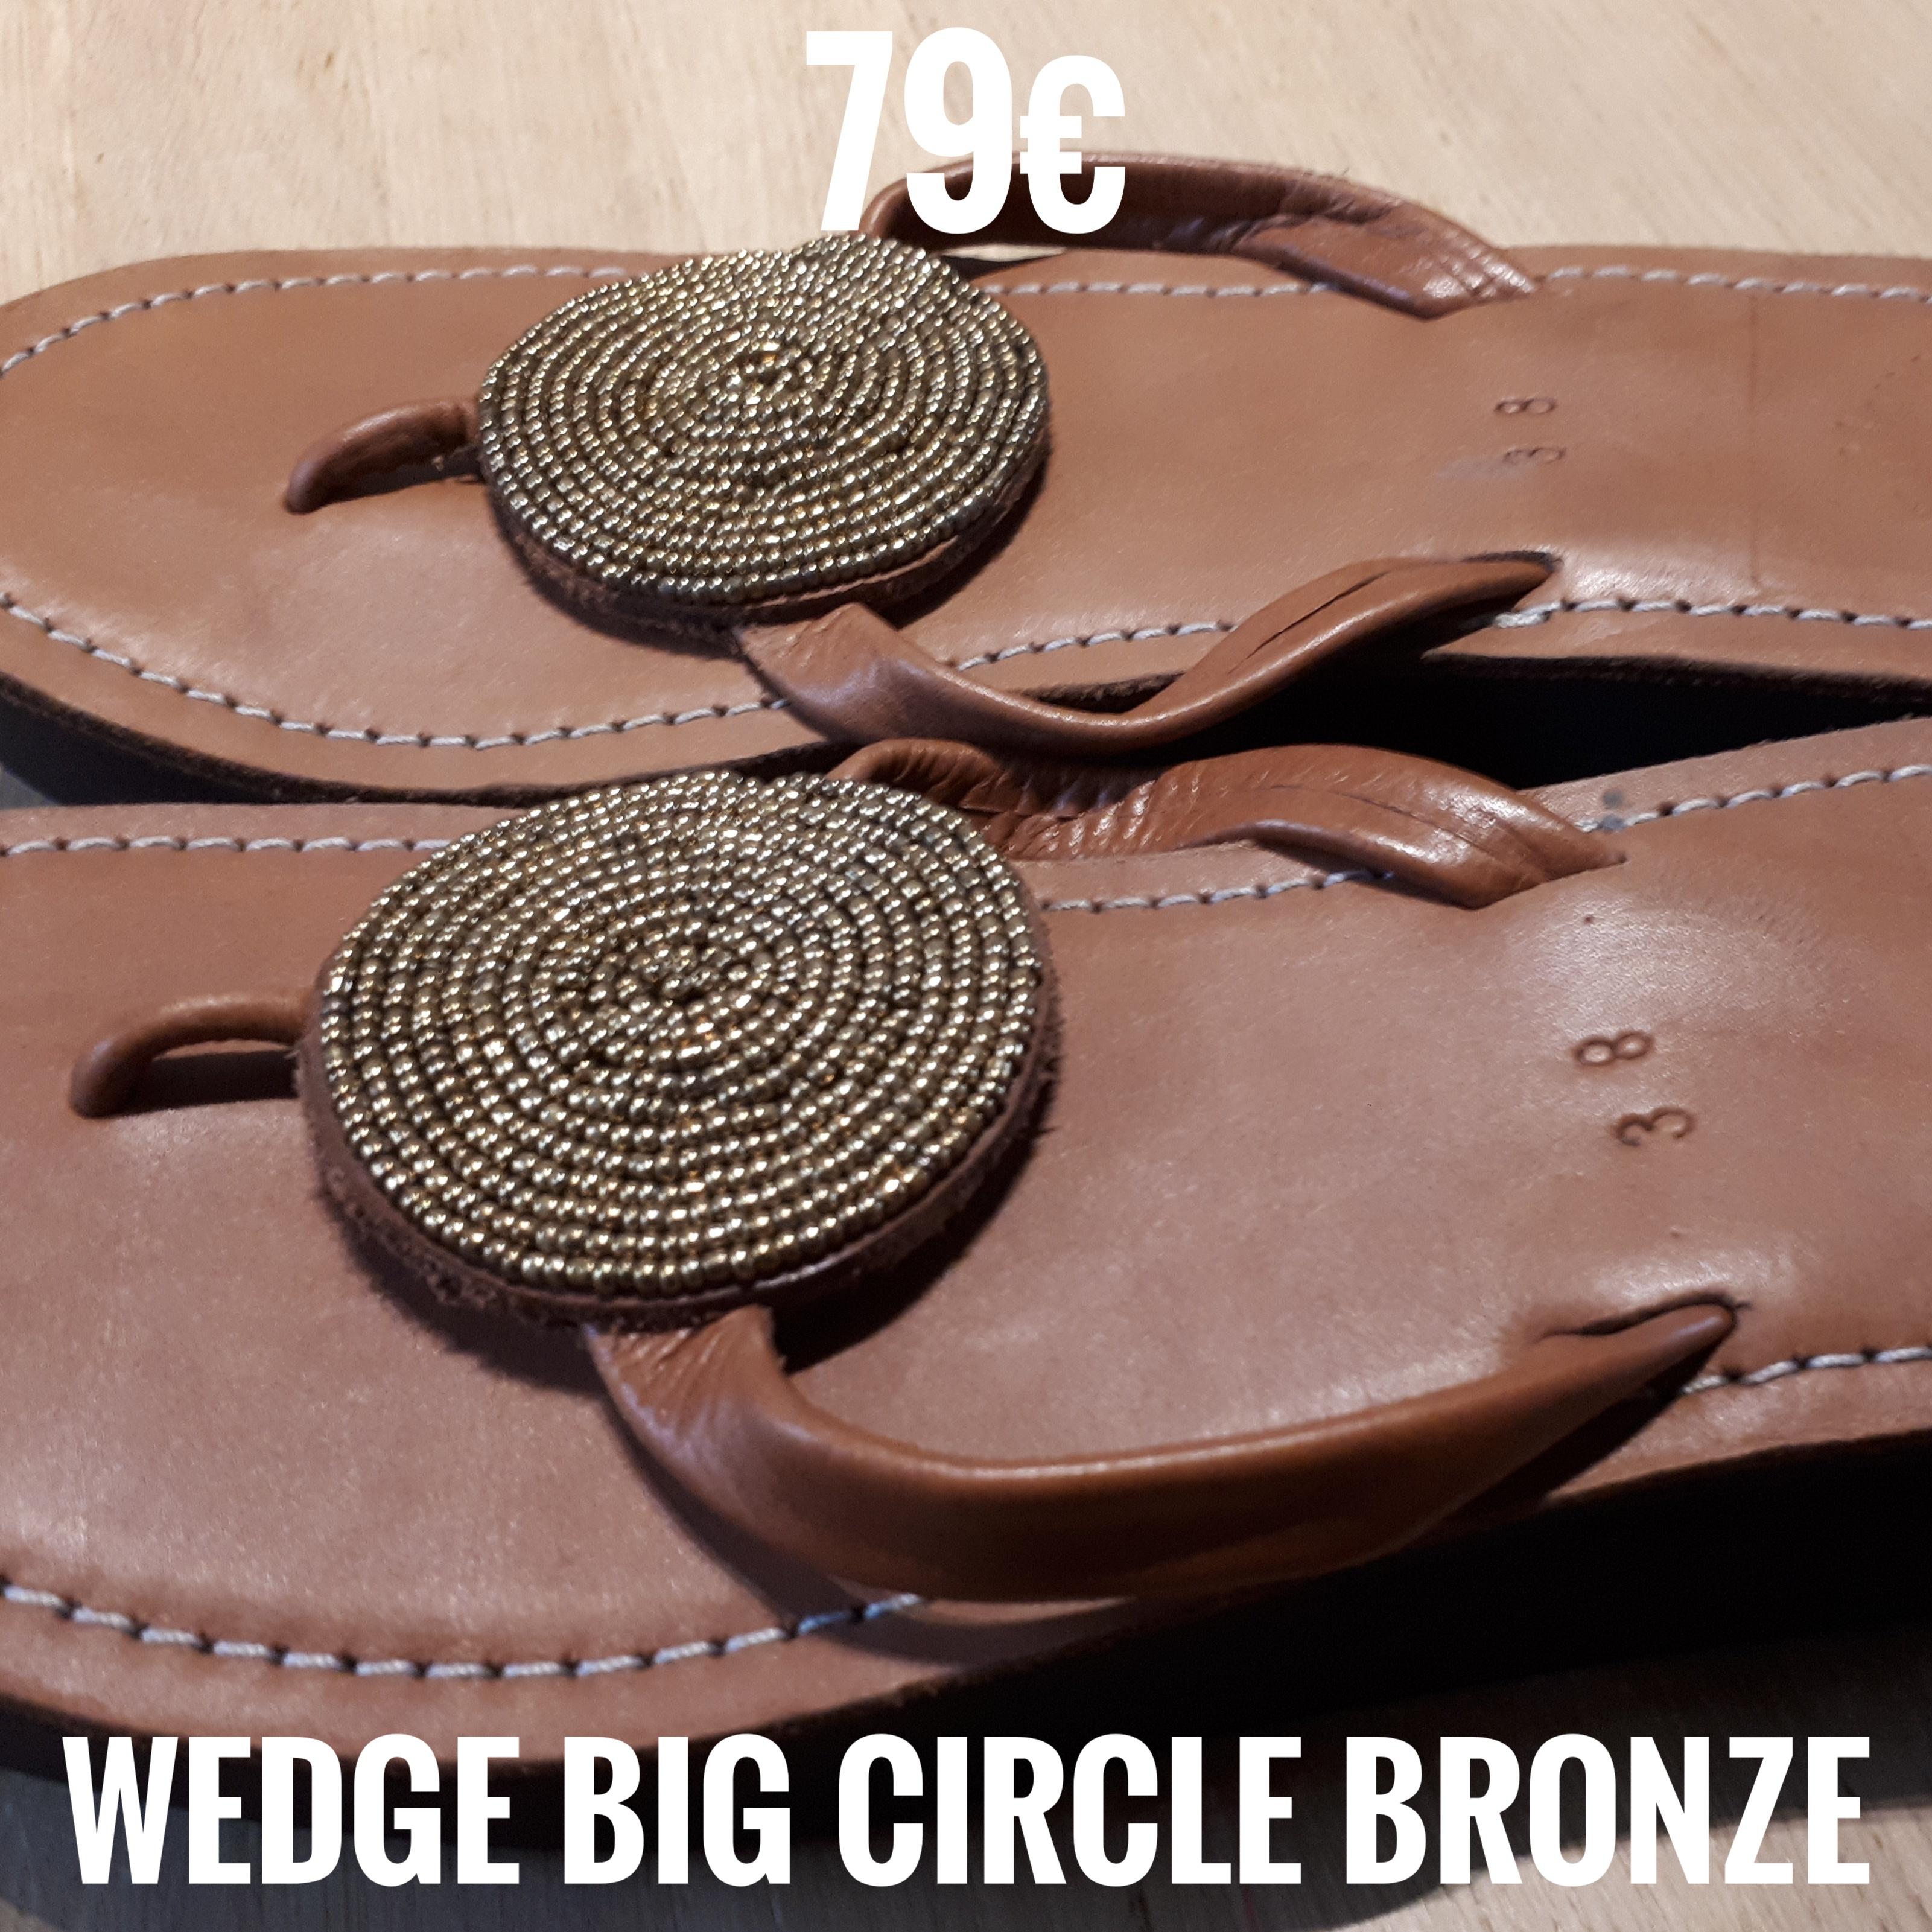 Wedge Big Circle Bronze